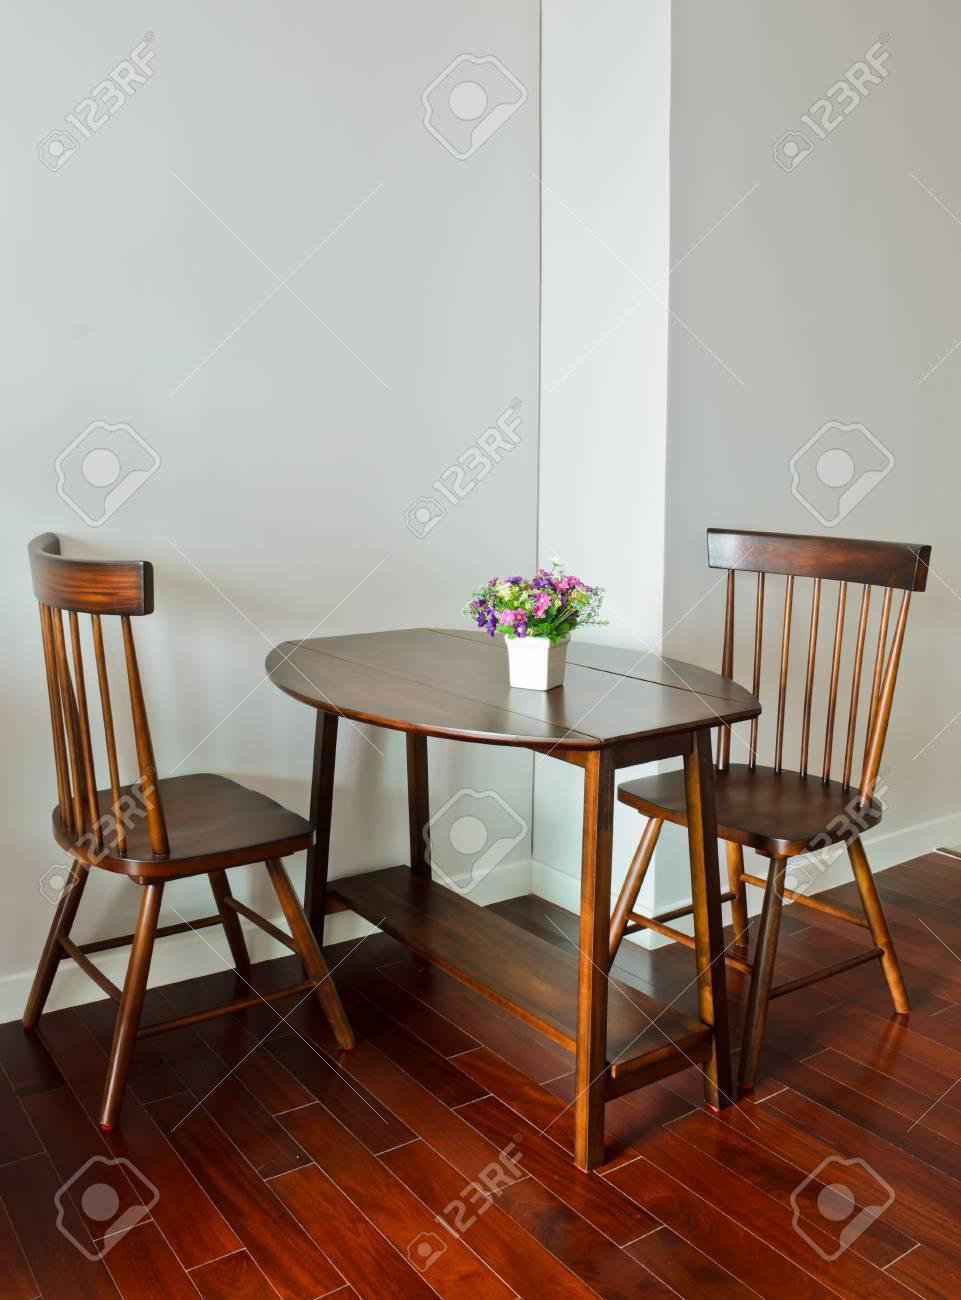 Mesa de comedor pequeña con maceta de flores artificiales